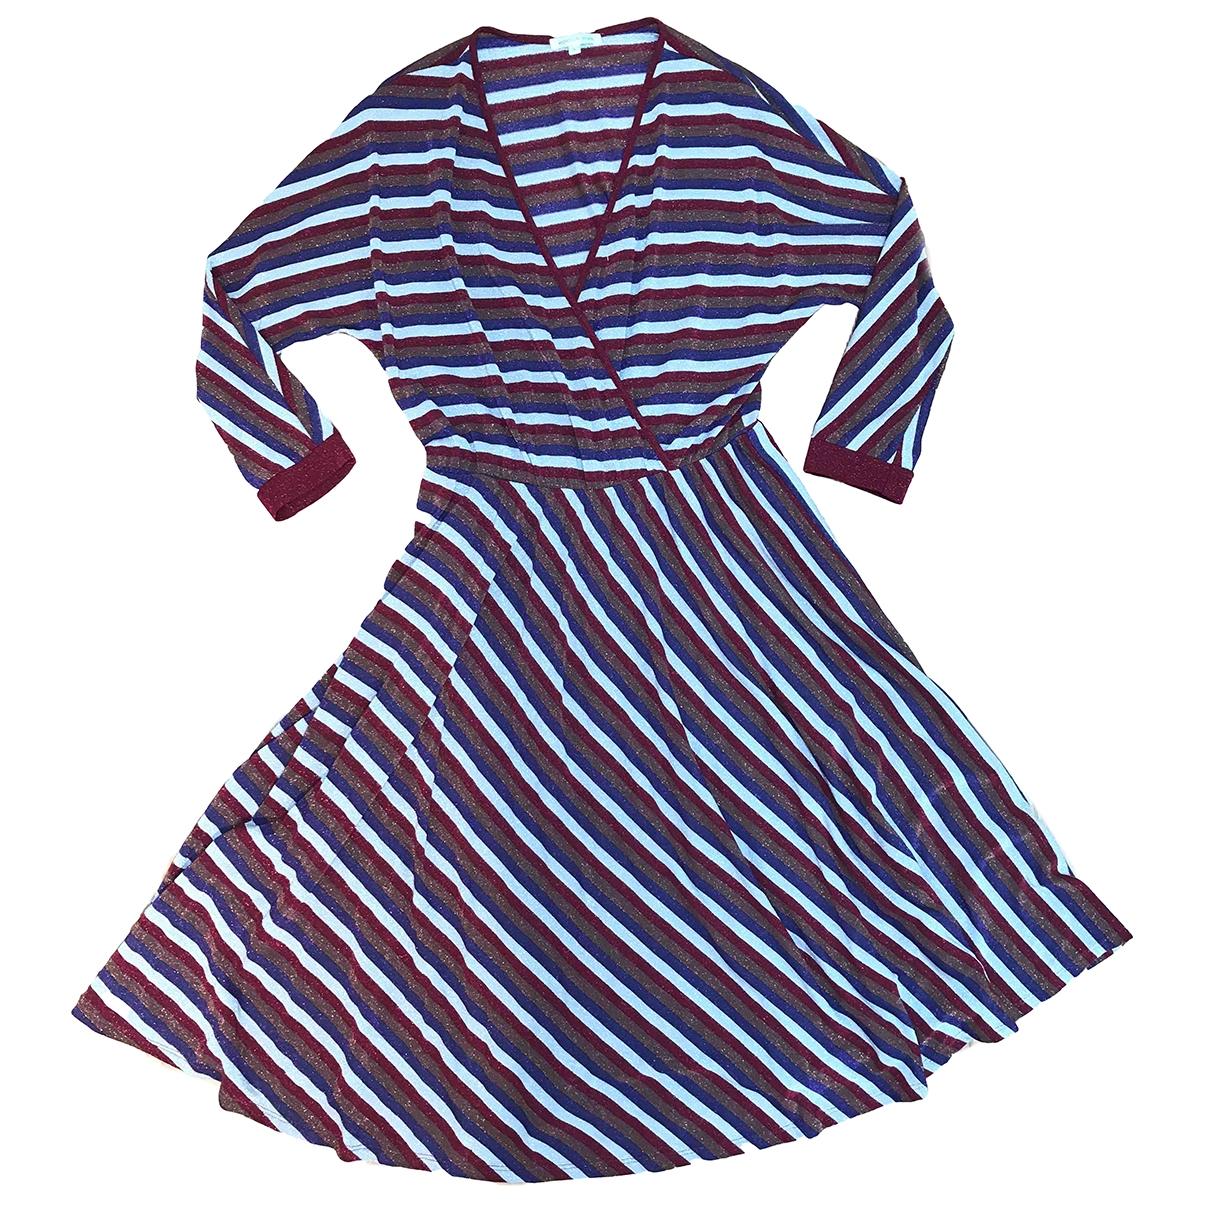 Non Signé / Unsigned \N Multicolour dress for Women S International